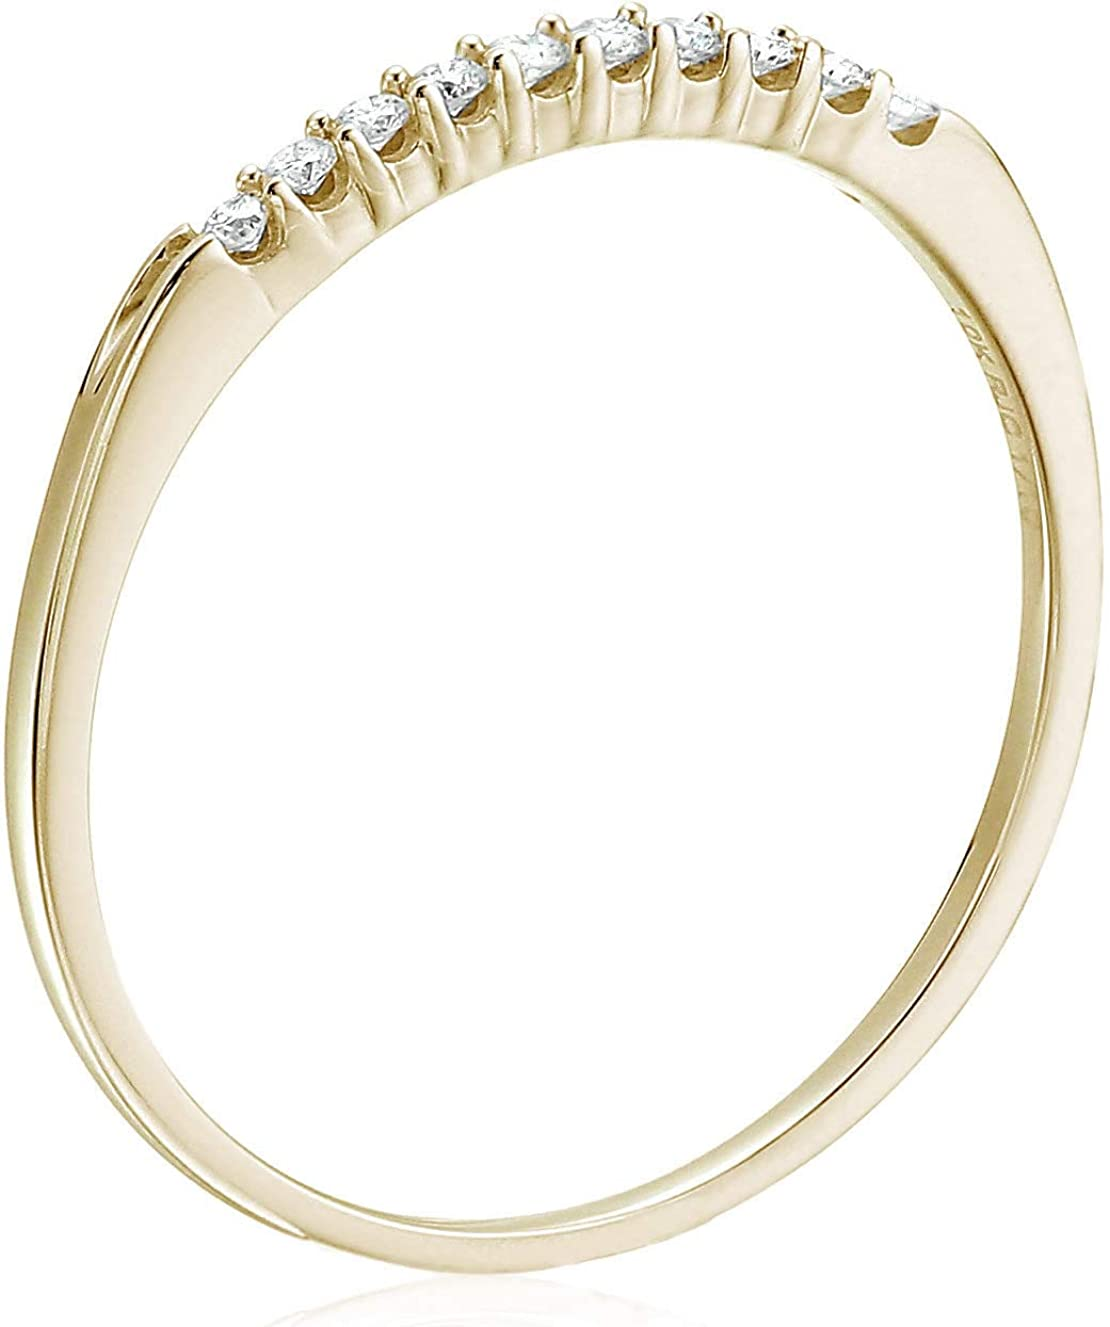 Vir Jewels 1/10 cttw Petite Diamond Wedding Band in 10K White Gold Prong Set